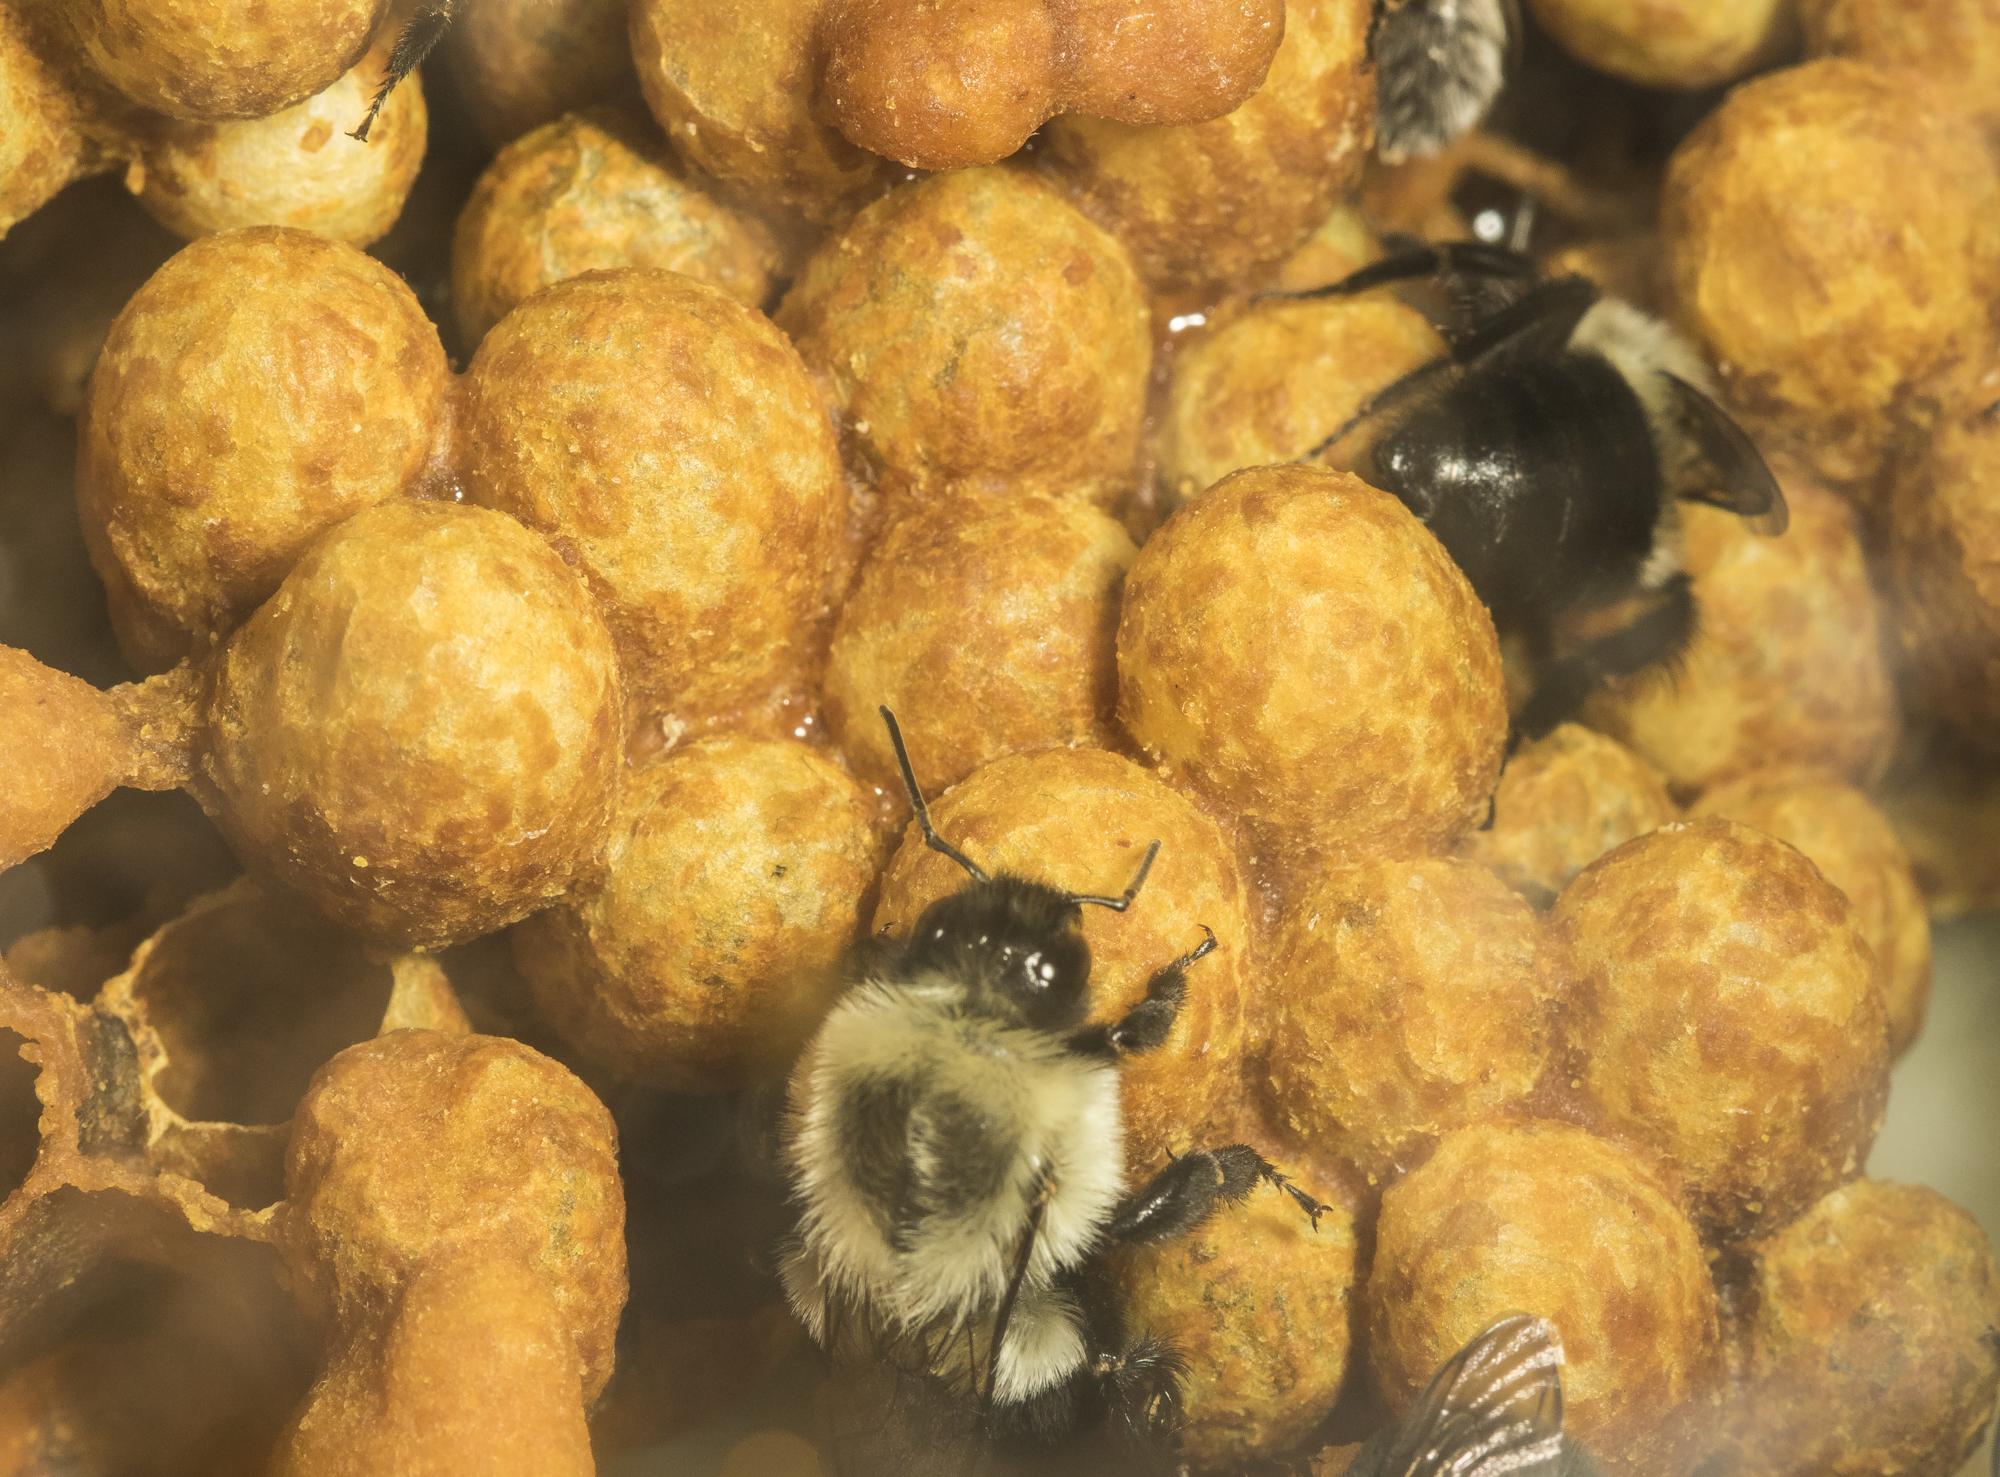 bumblebee nest in box